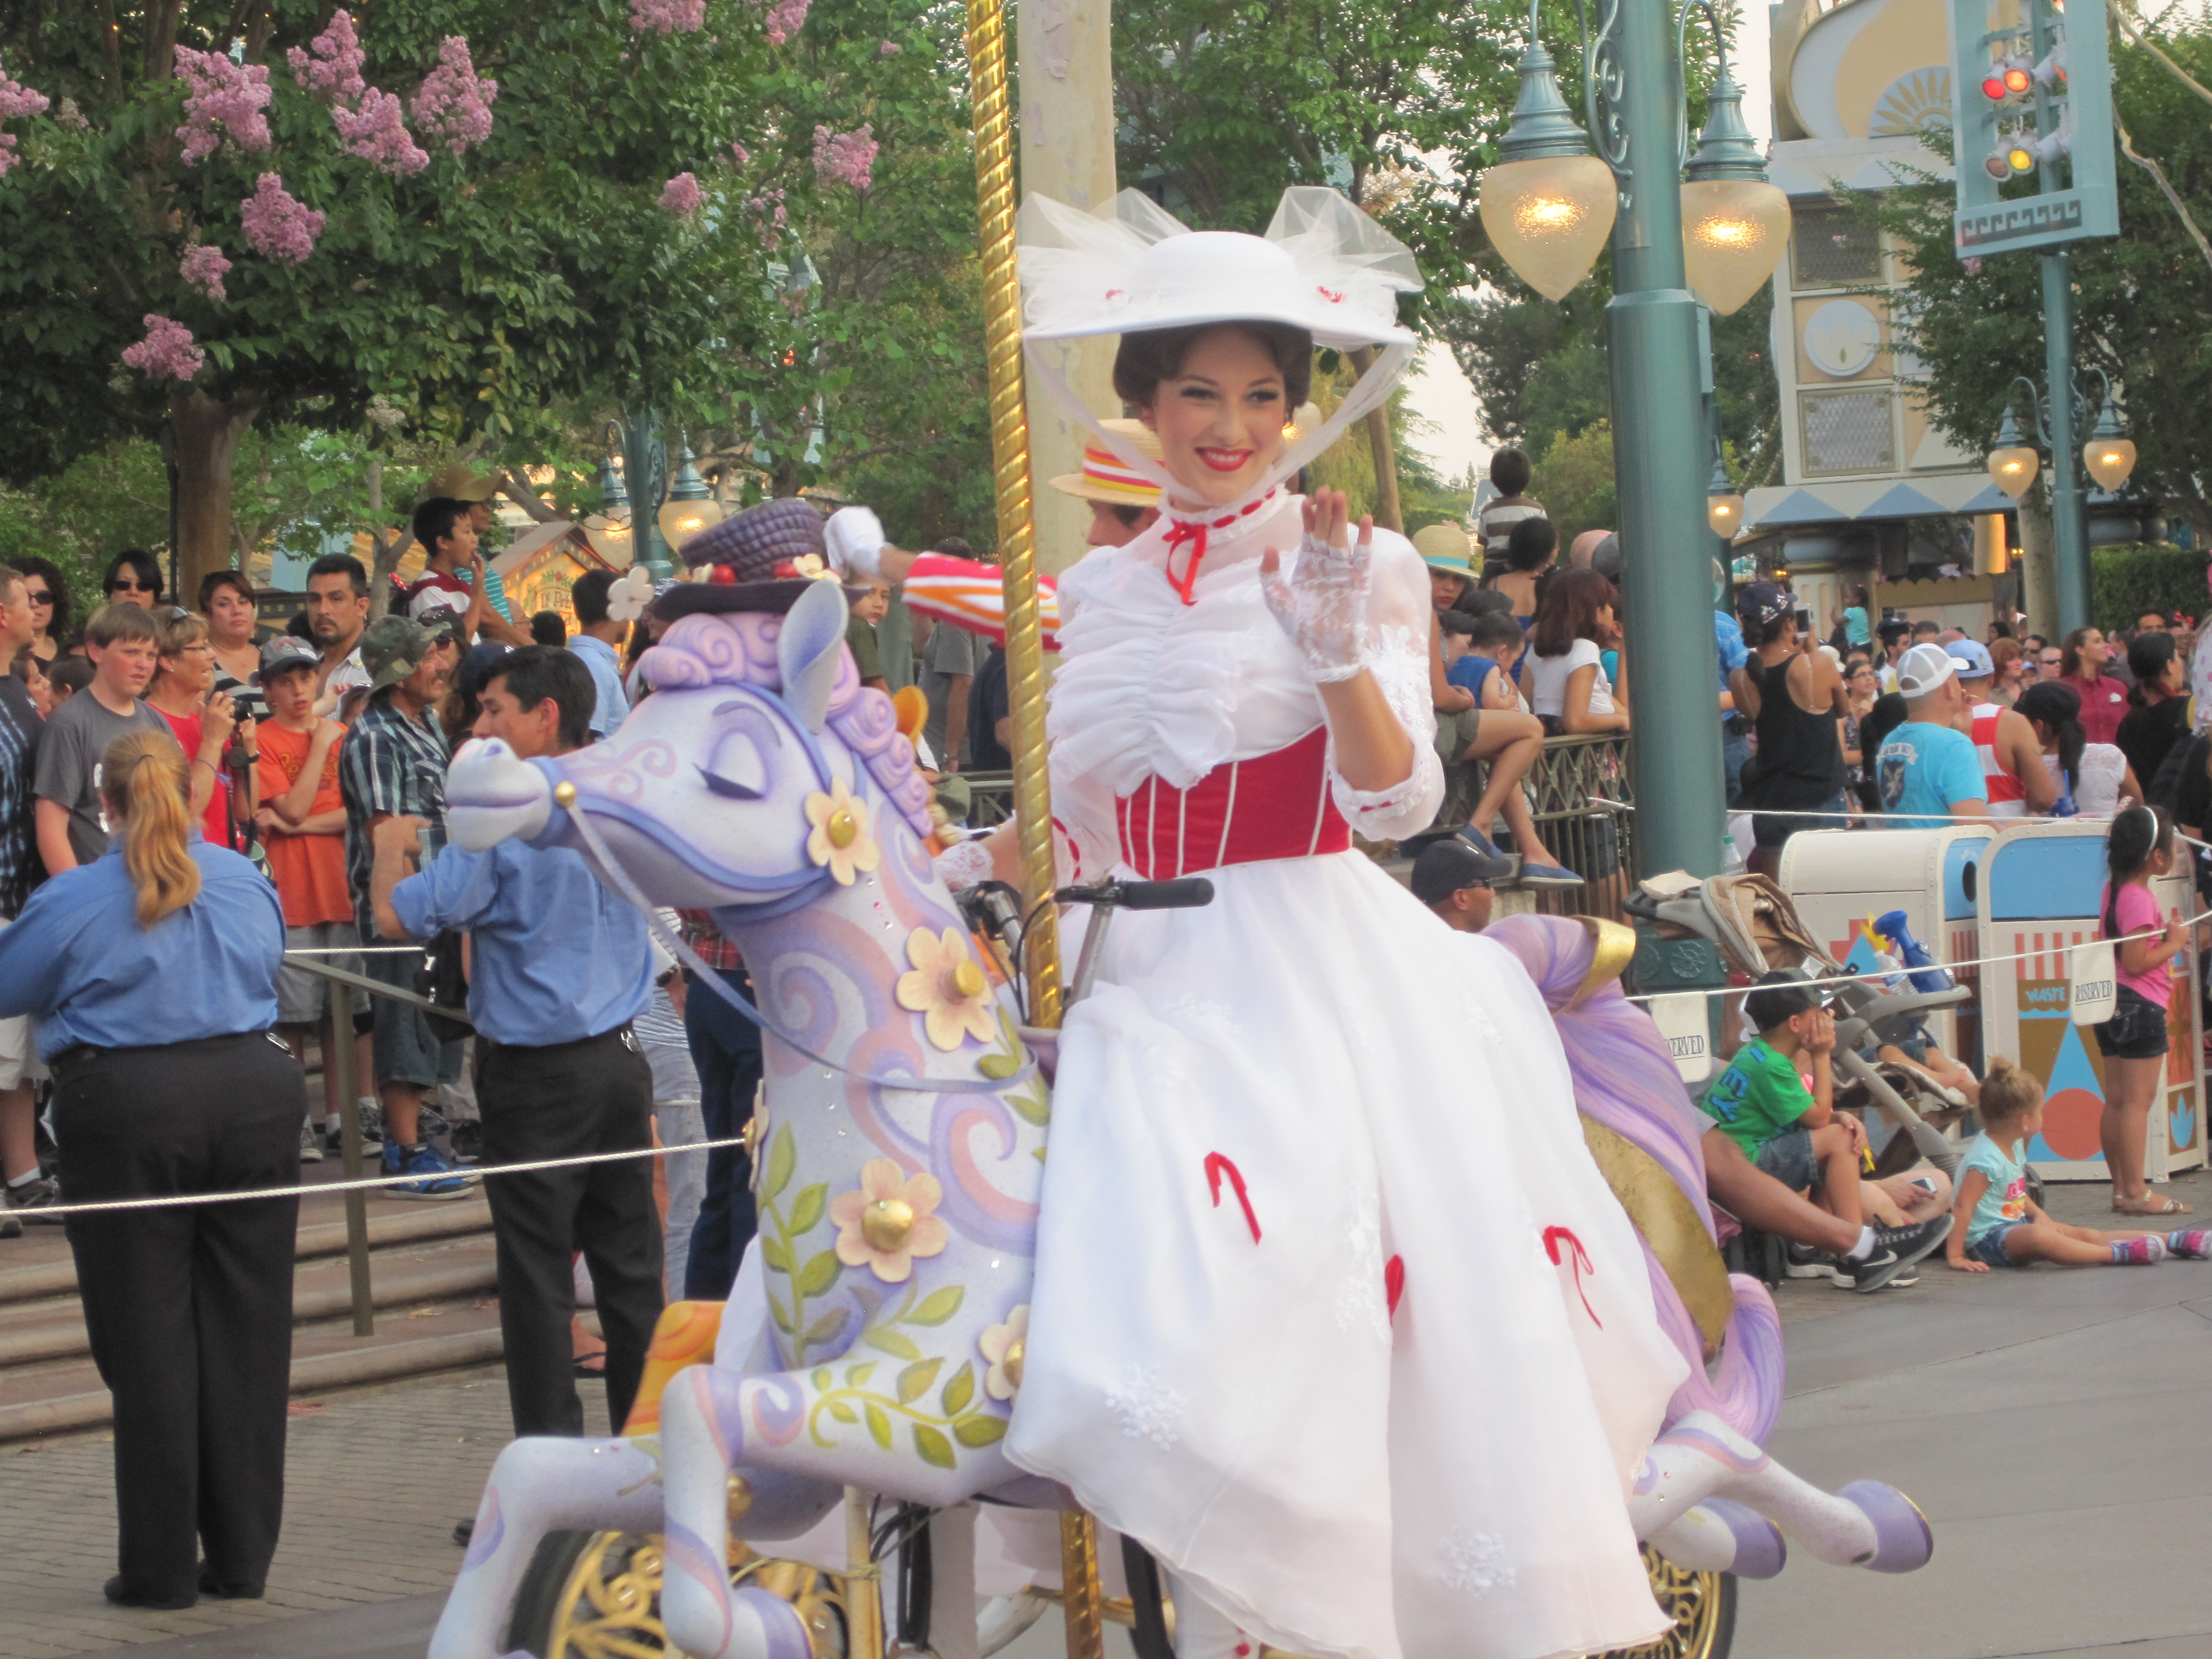 Disneyland vs California Adventure theme park. This is a parade